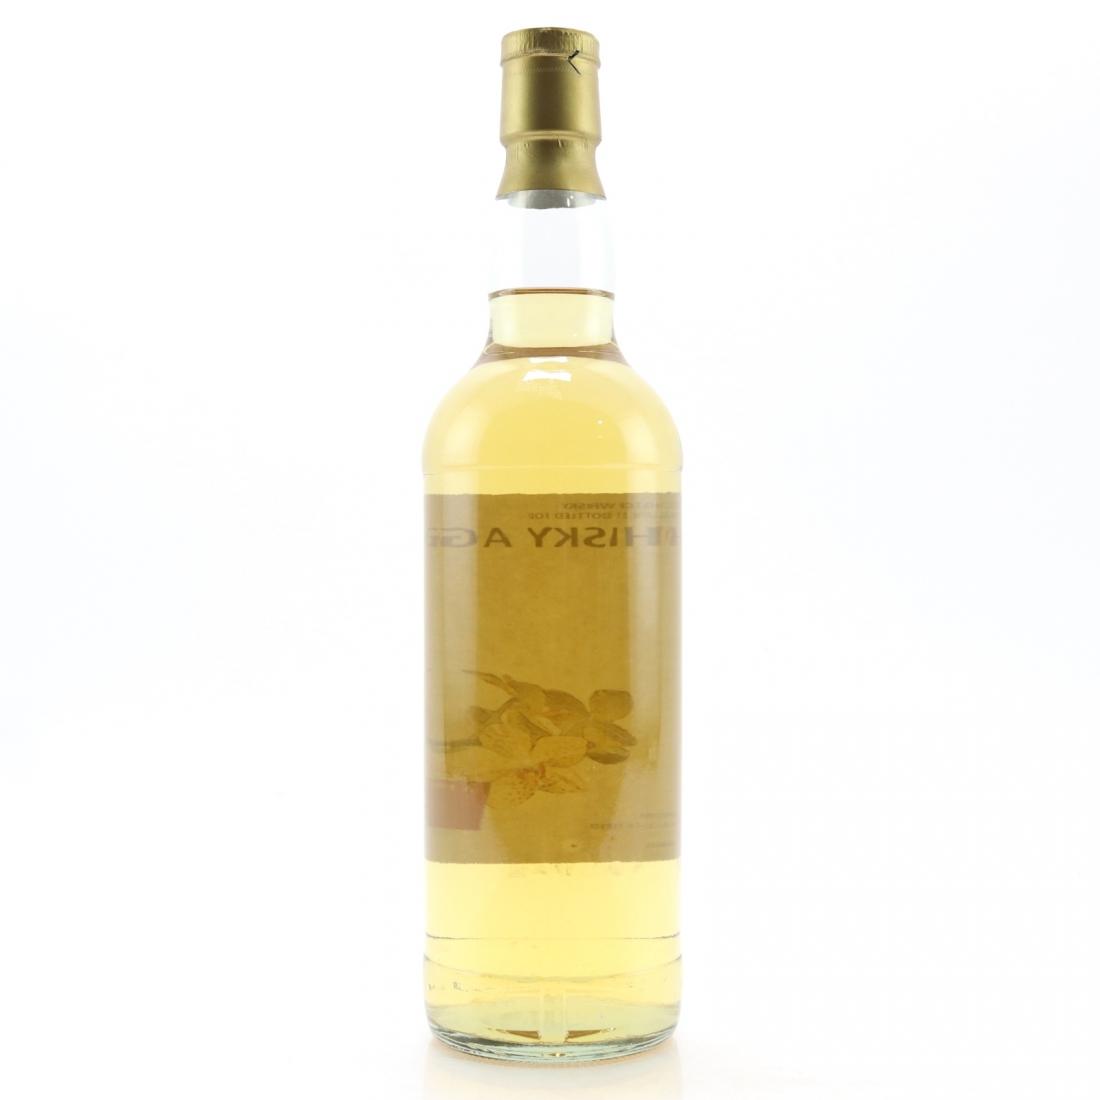 Bowmore 1998 Whisky Agency 10 Year Old / Villa Konthor